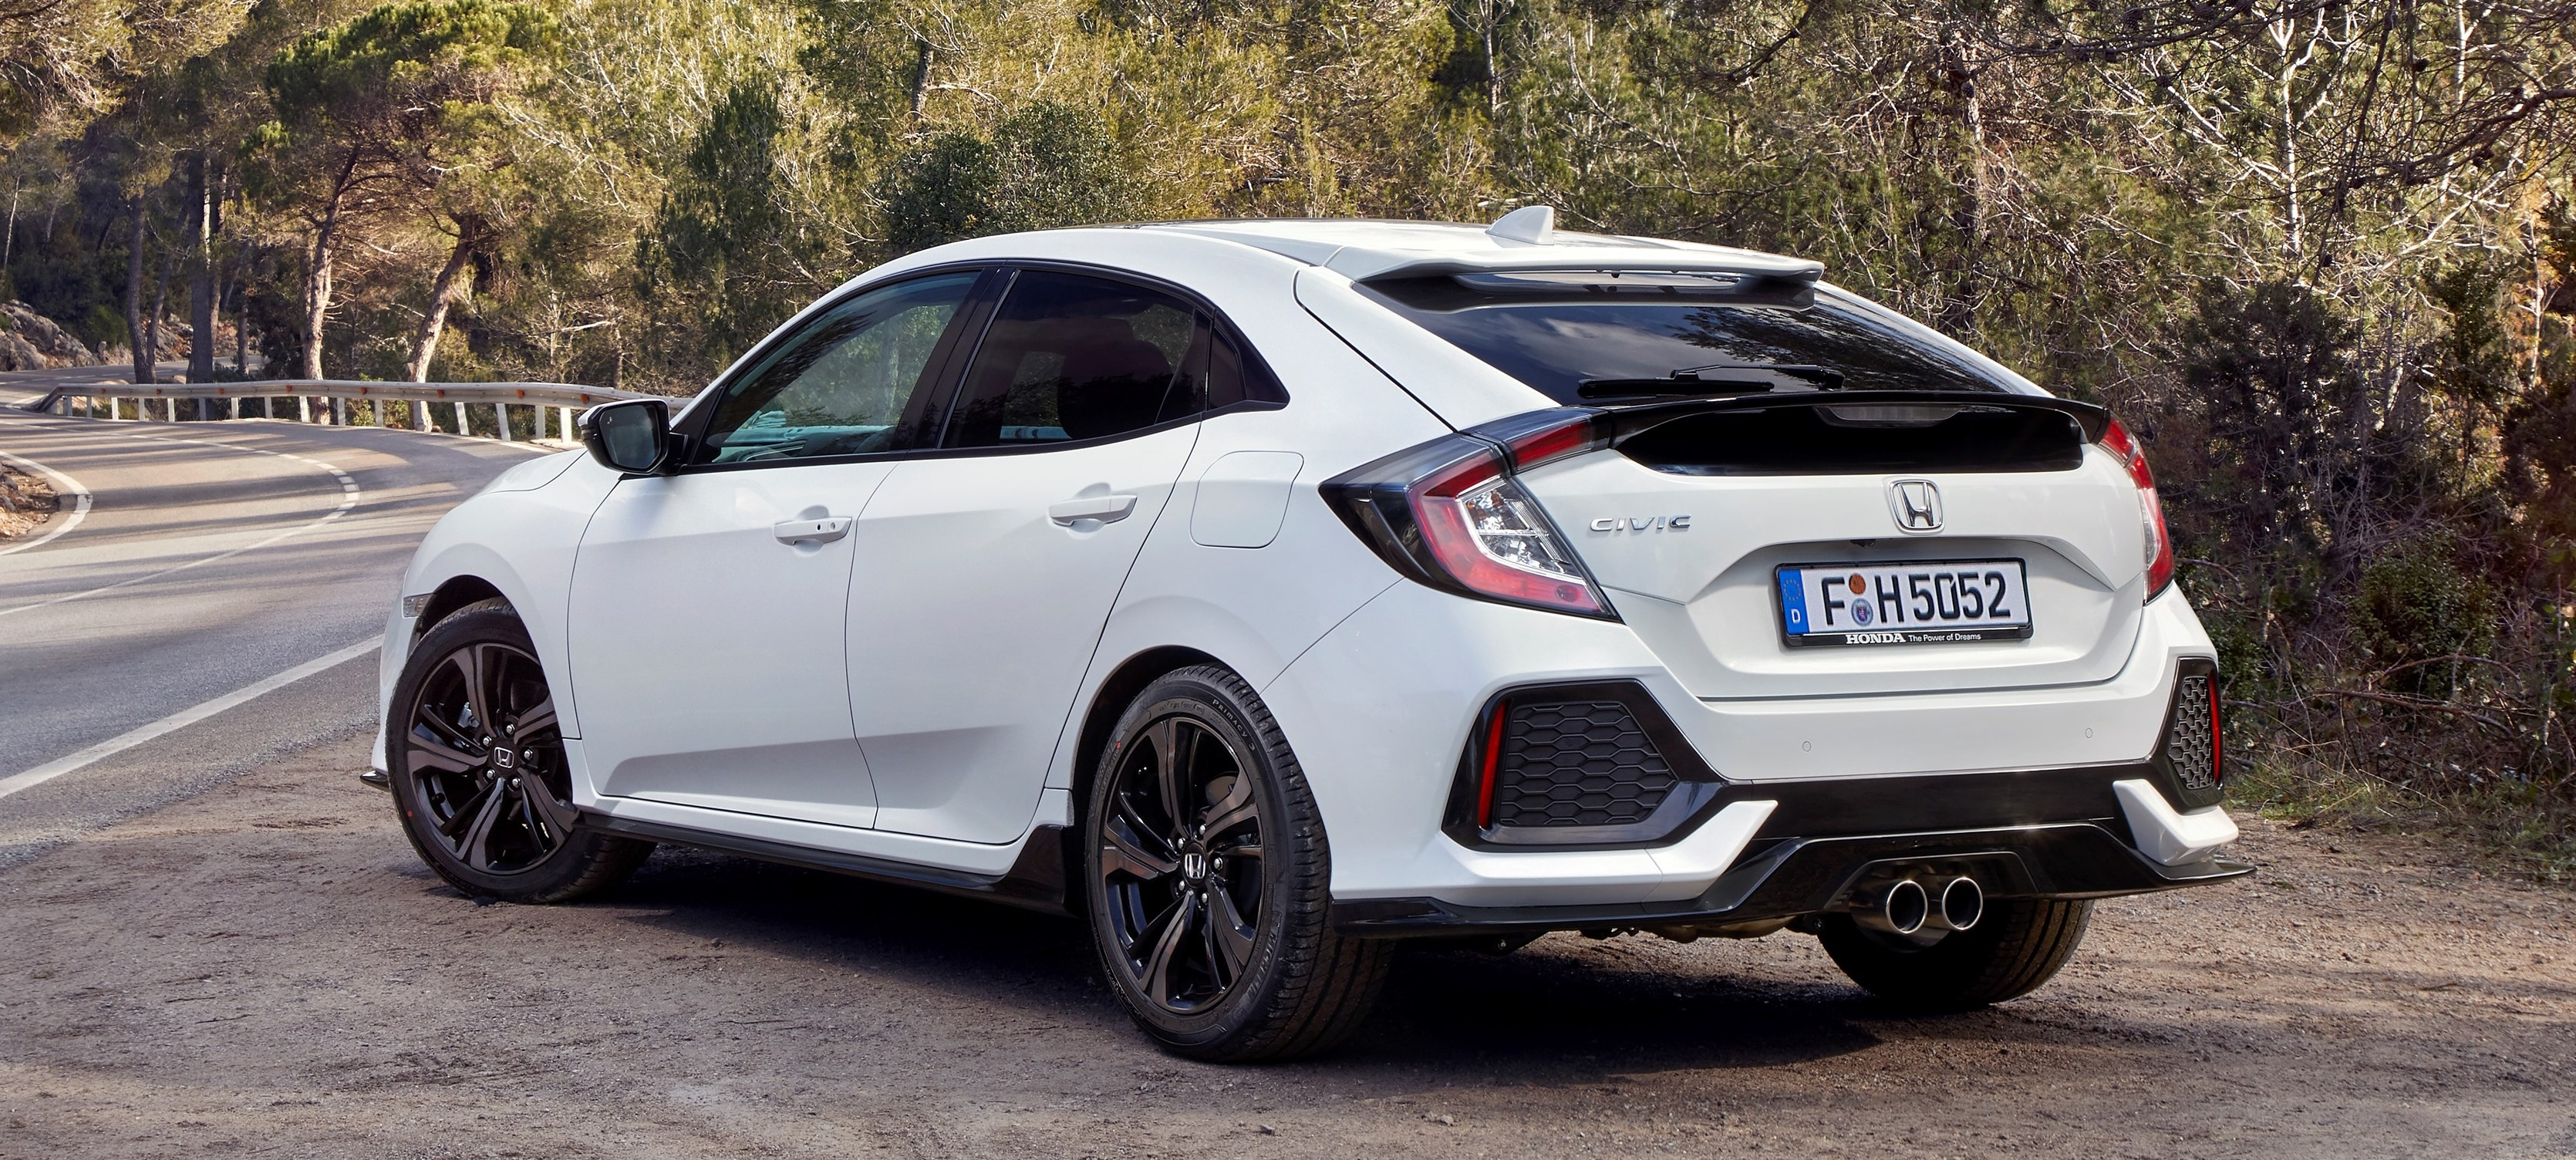 GALERI: Perincian Honda Civic Euro Hatchback 2017 Paul Tan ...